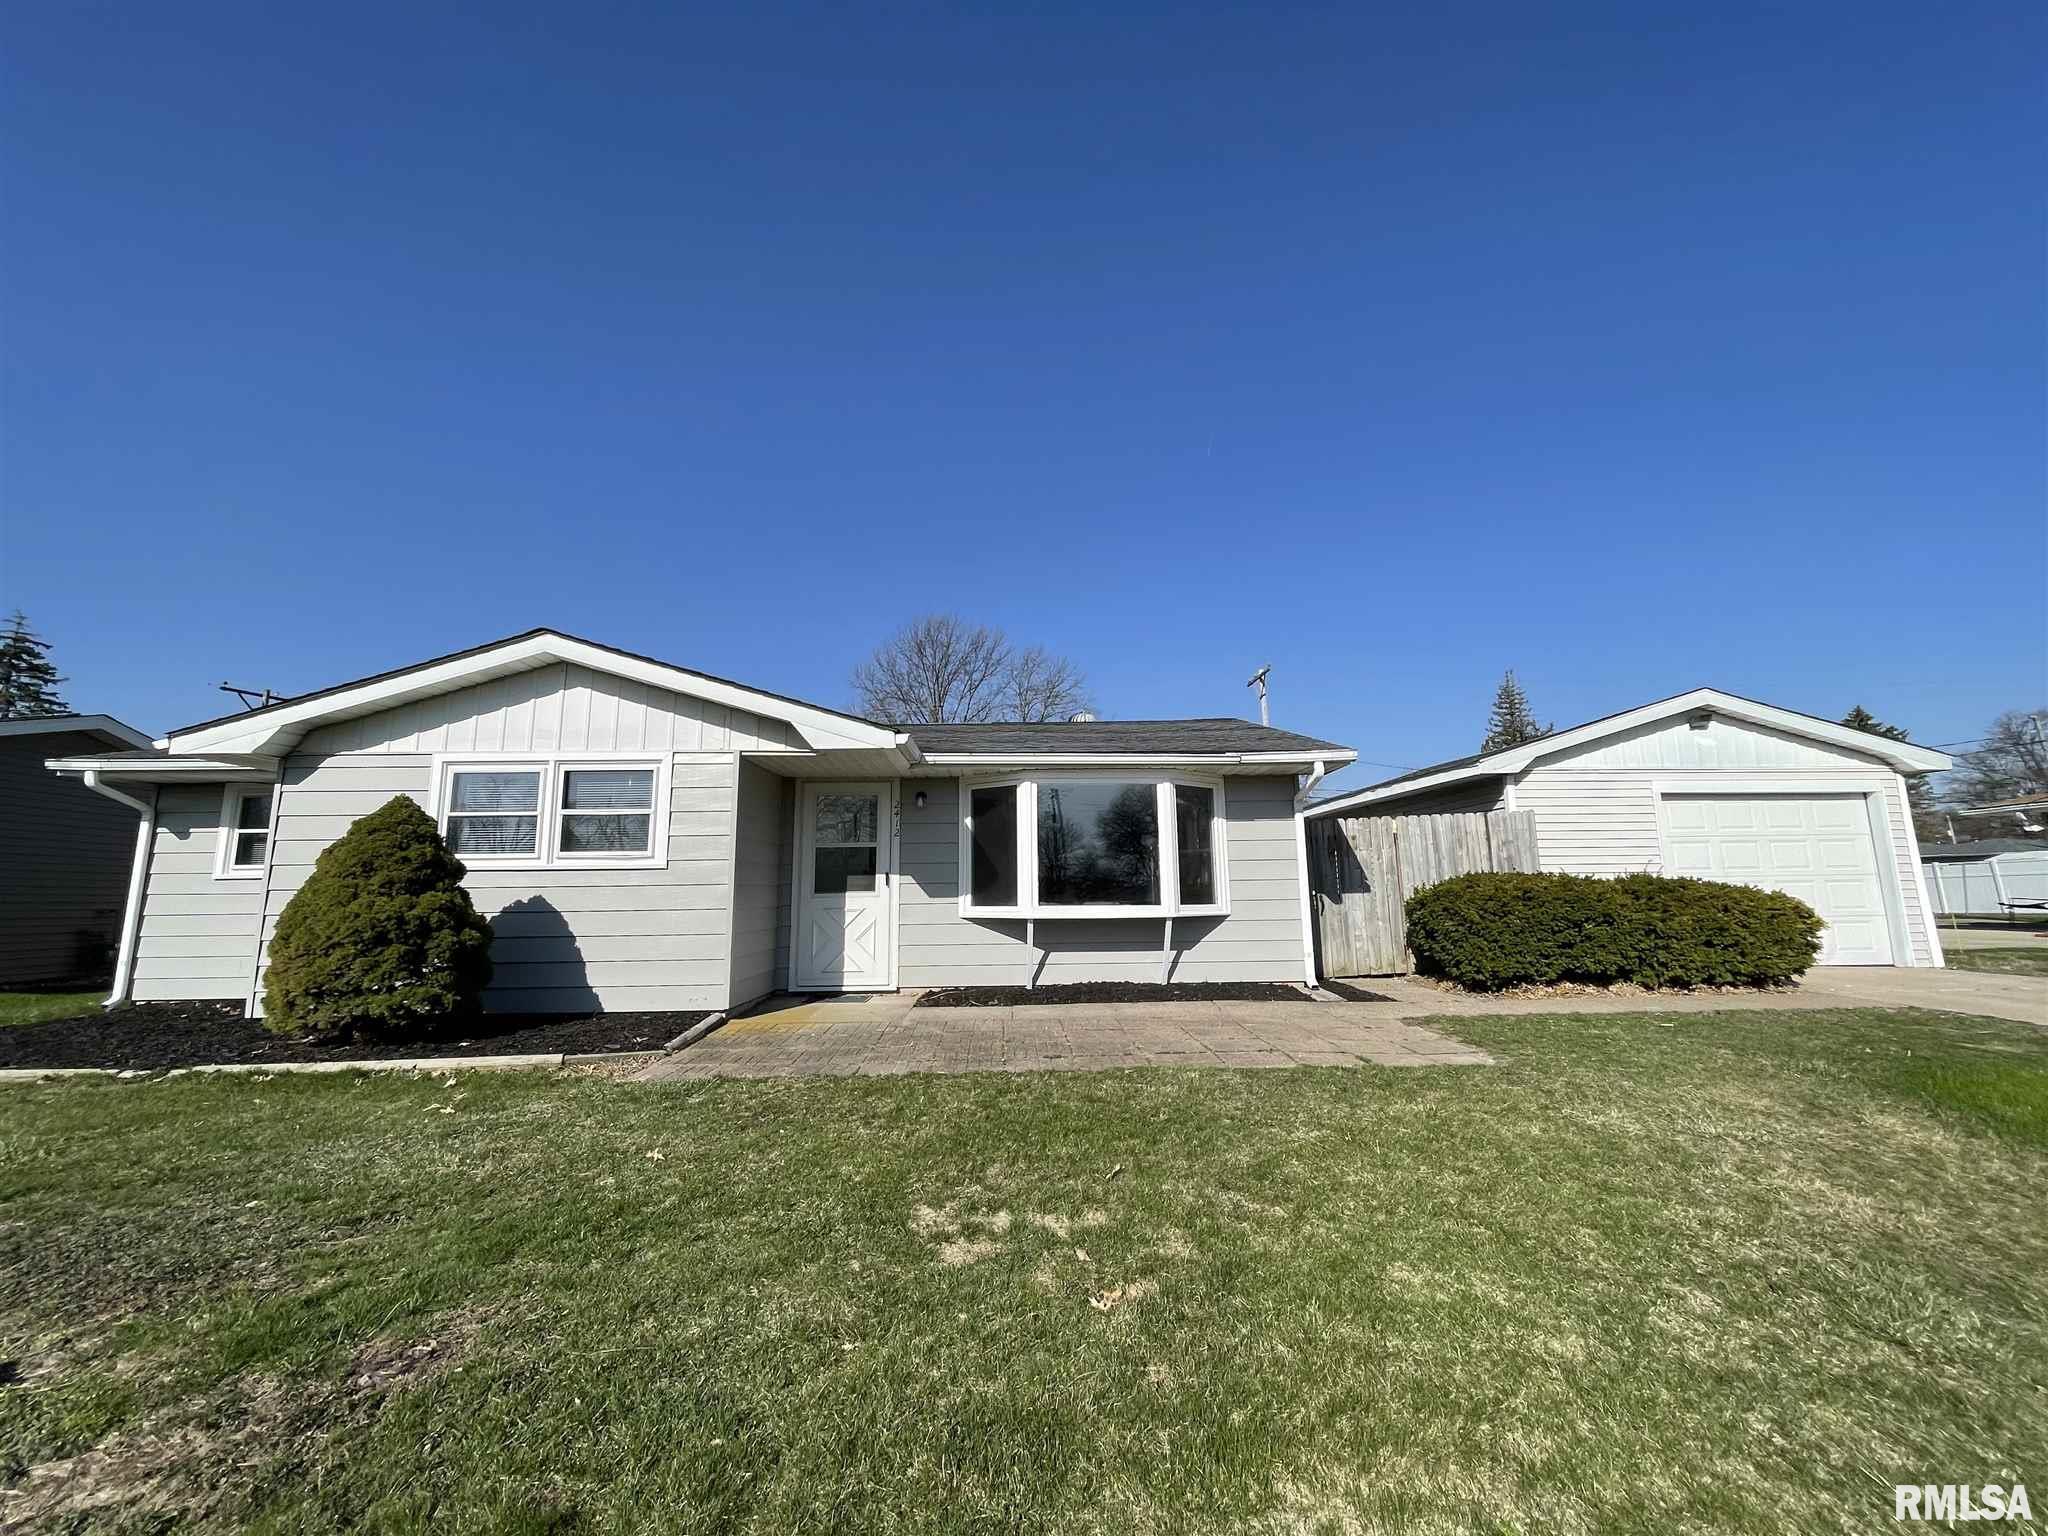 2412 11TH Property Photo - Silvis, IL real estate listing